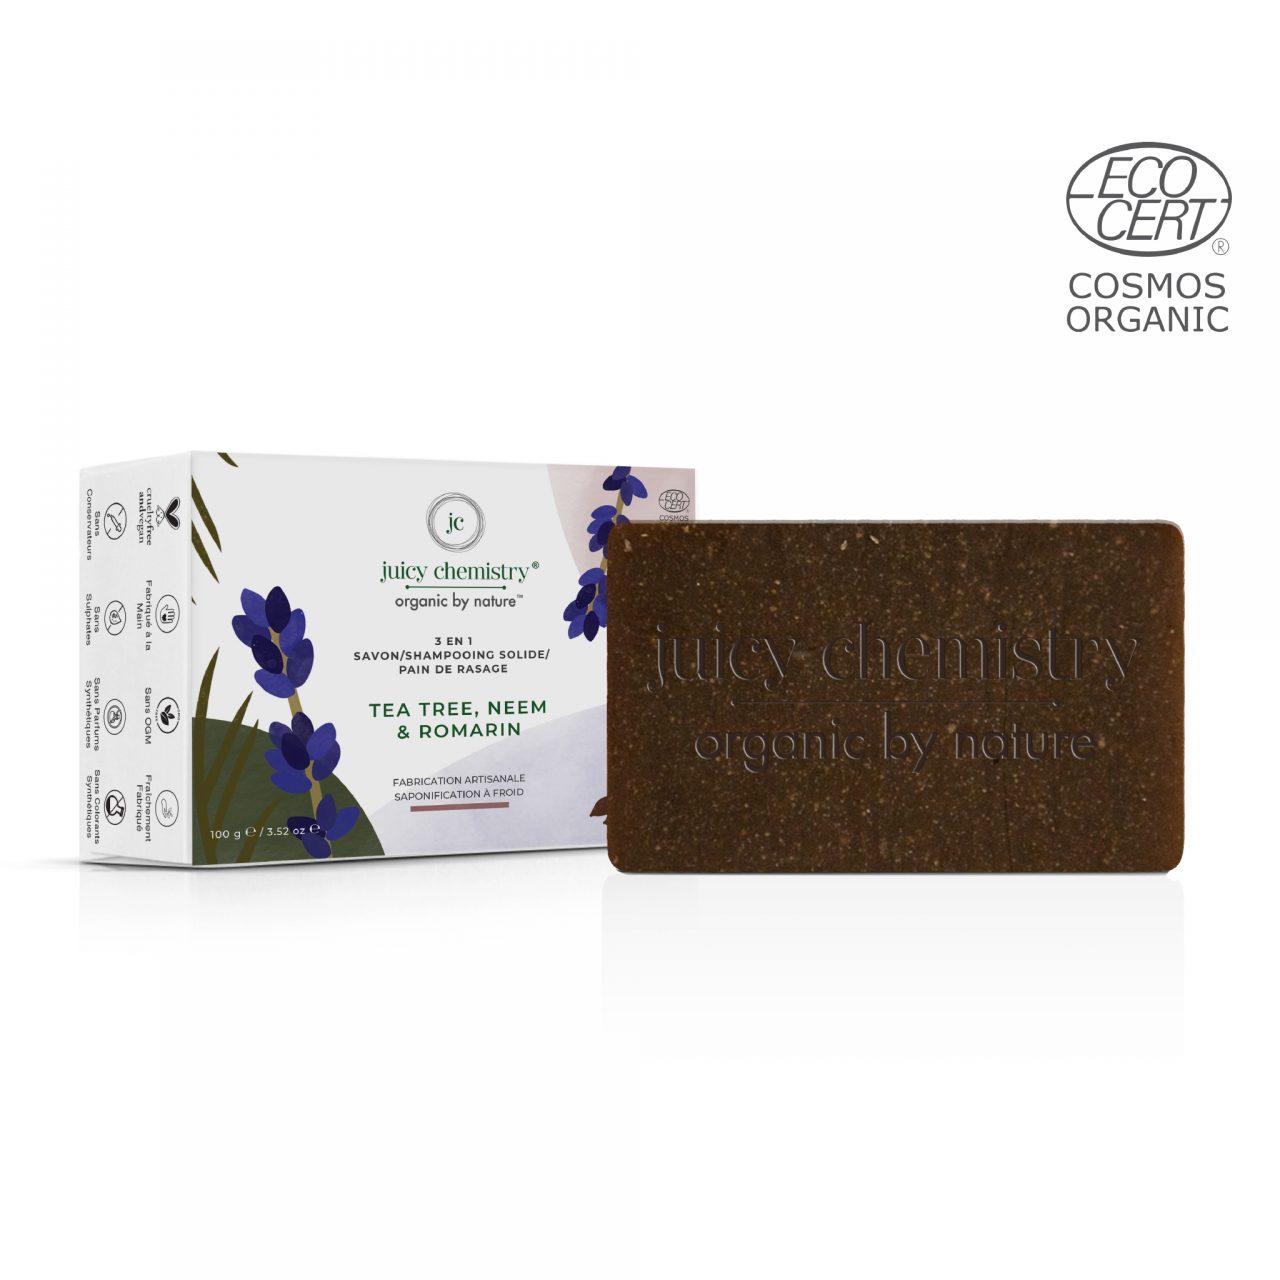 Savon-Shampooing Solide-Pain de Rasage Tea Tree, Neem & Romarin Composition